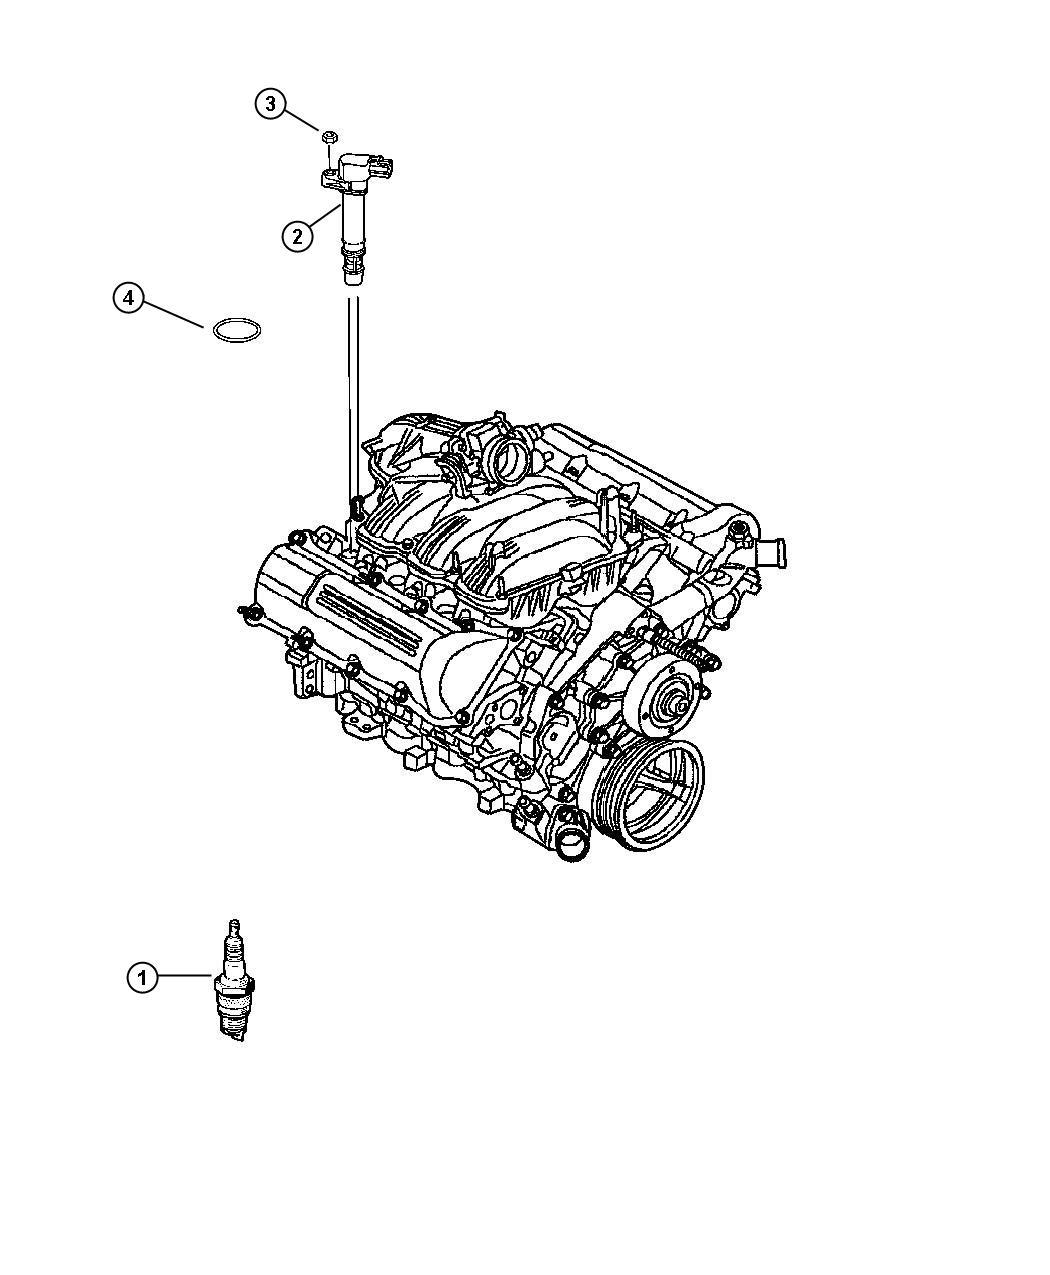 2006 Dodge Dakota Slt Quad Cab 4 7l V8 M  T 4x4 Coil  Ignition  Evo  4 7l 6 Cyl Gas   Wires